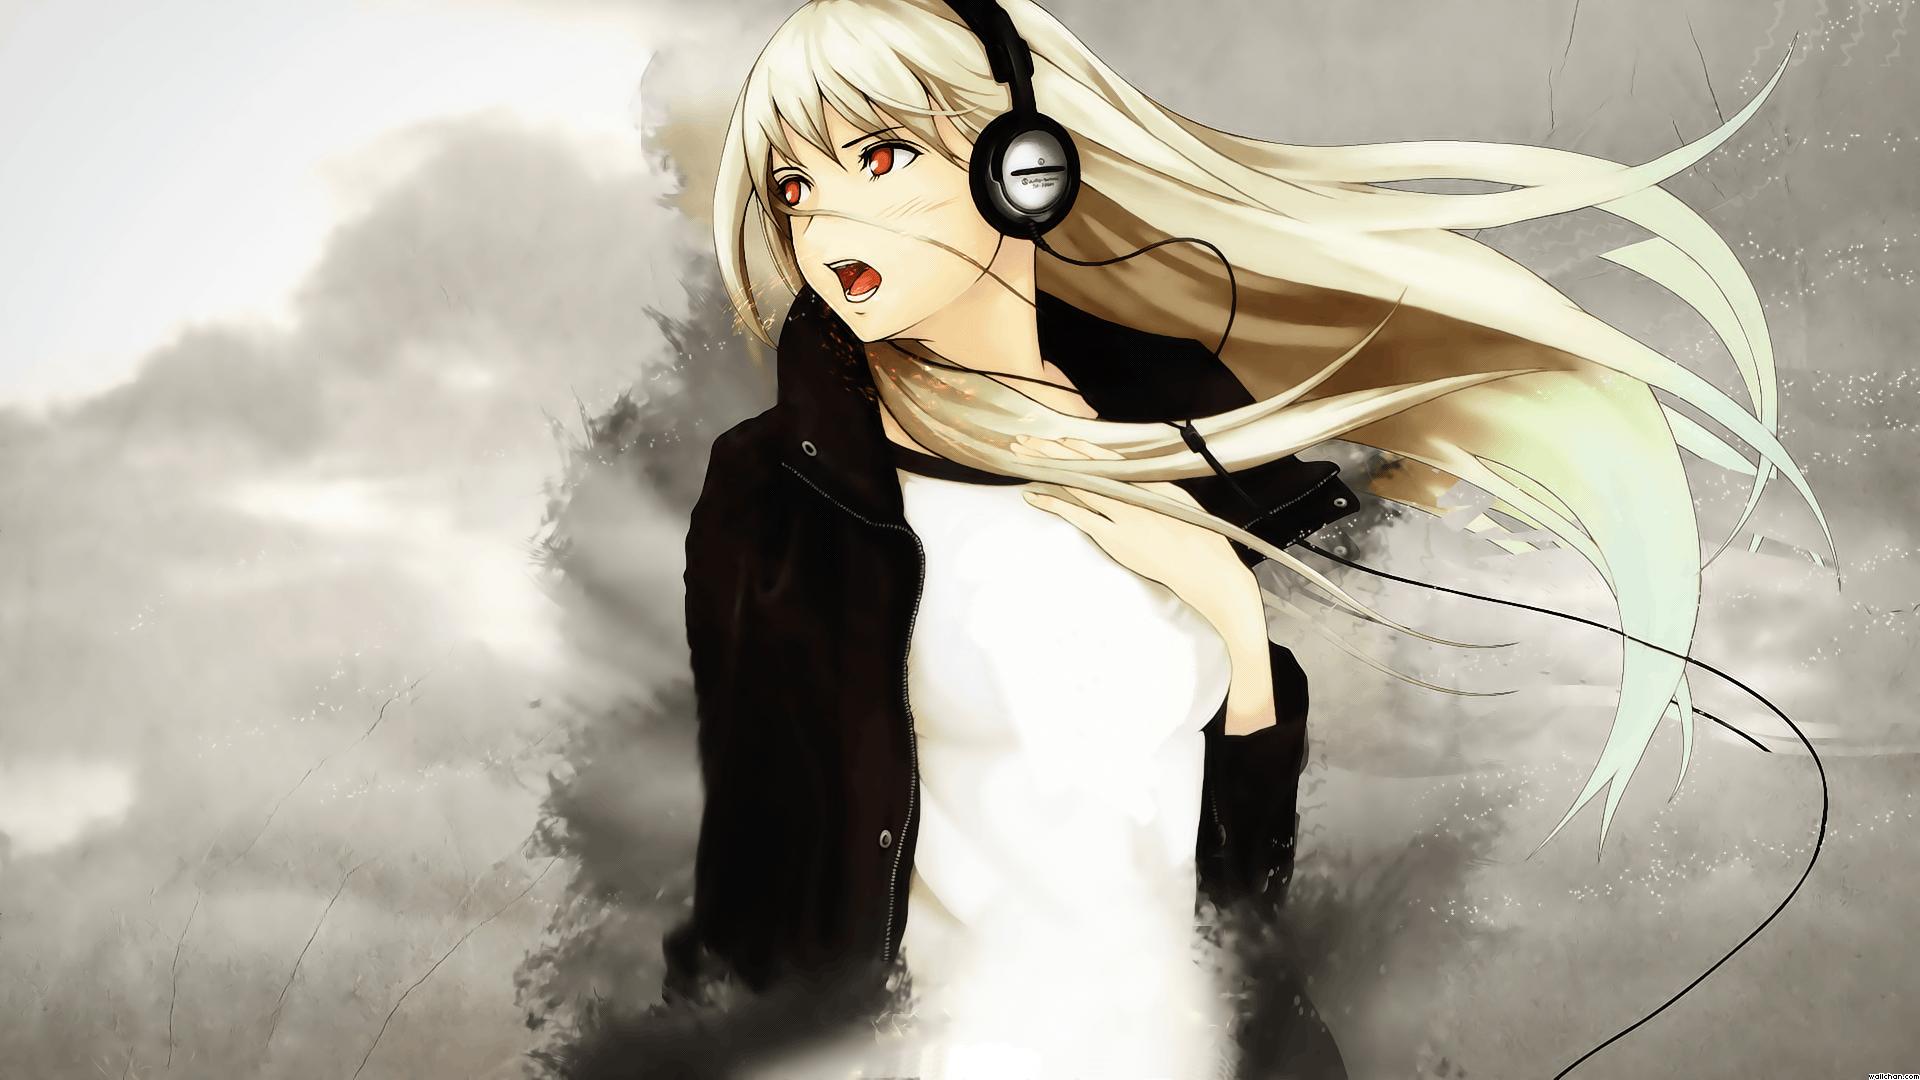 Anime Manga Wallpapers Top Free Anime Manga Backgrounds